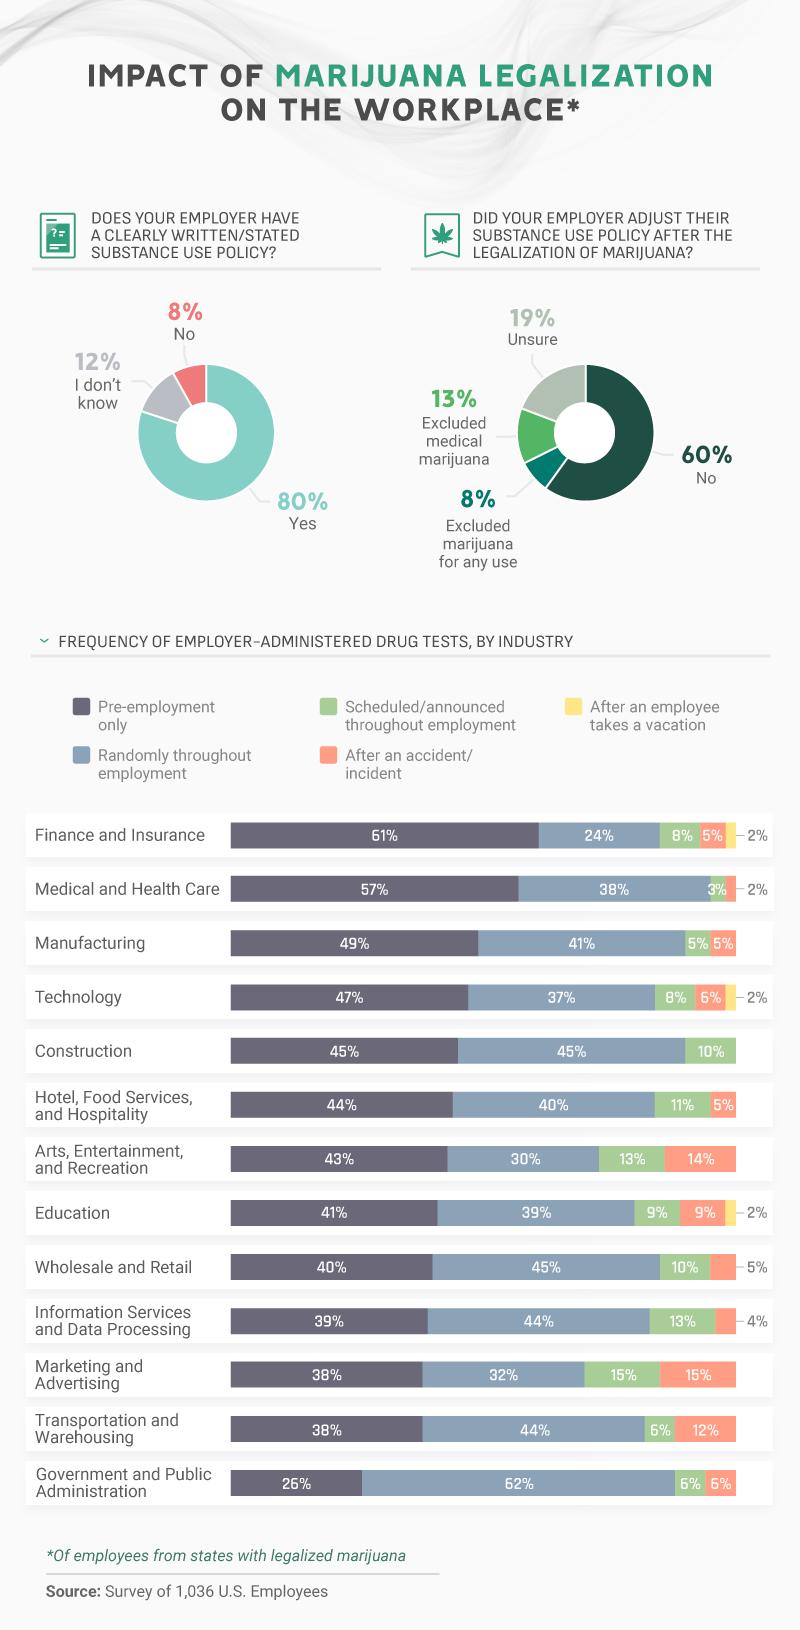 Impact of Marijuana Legalization on the Workplace